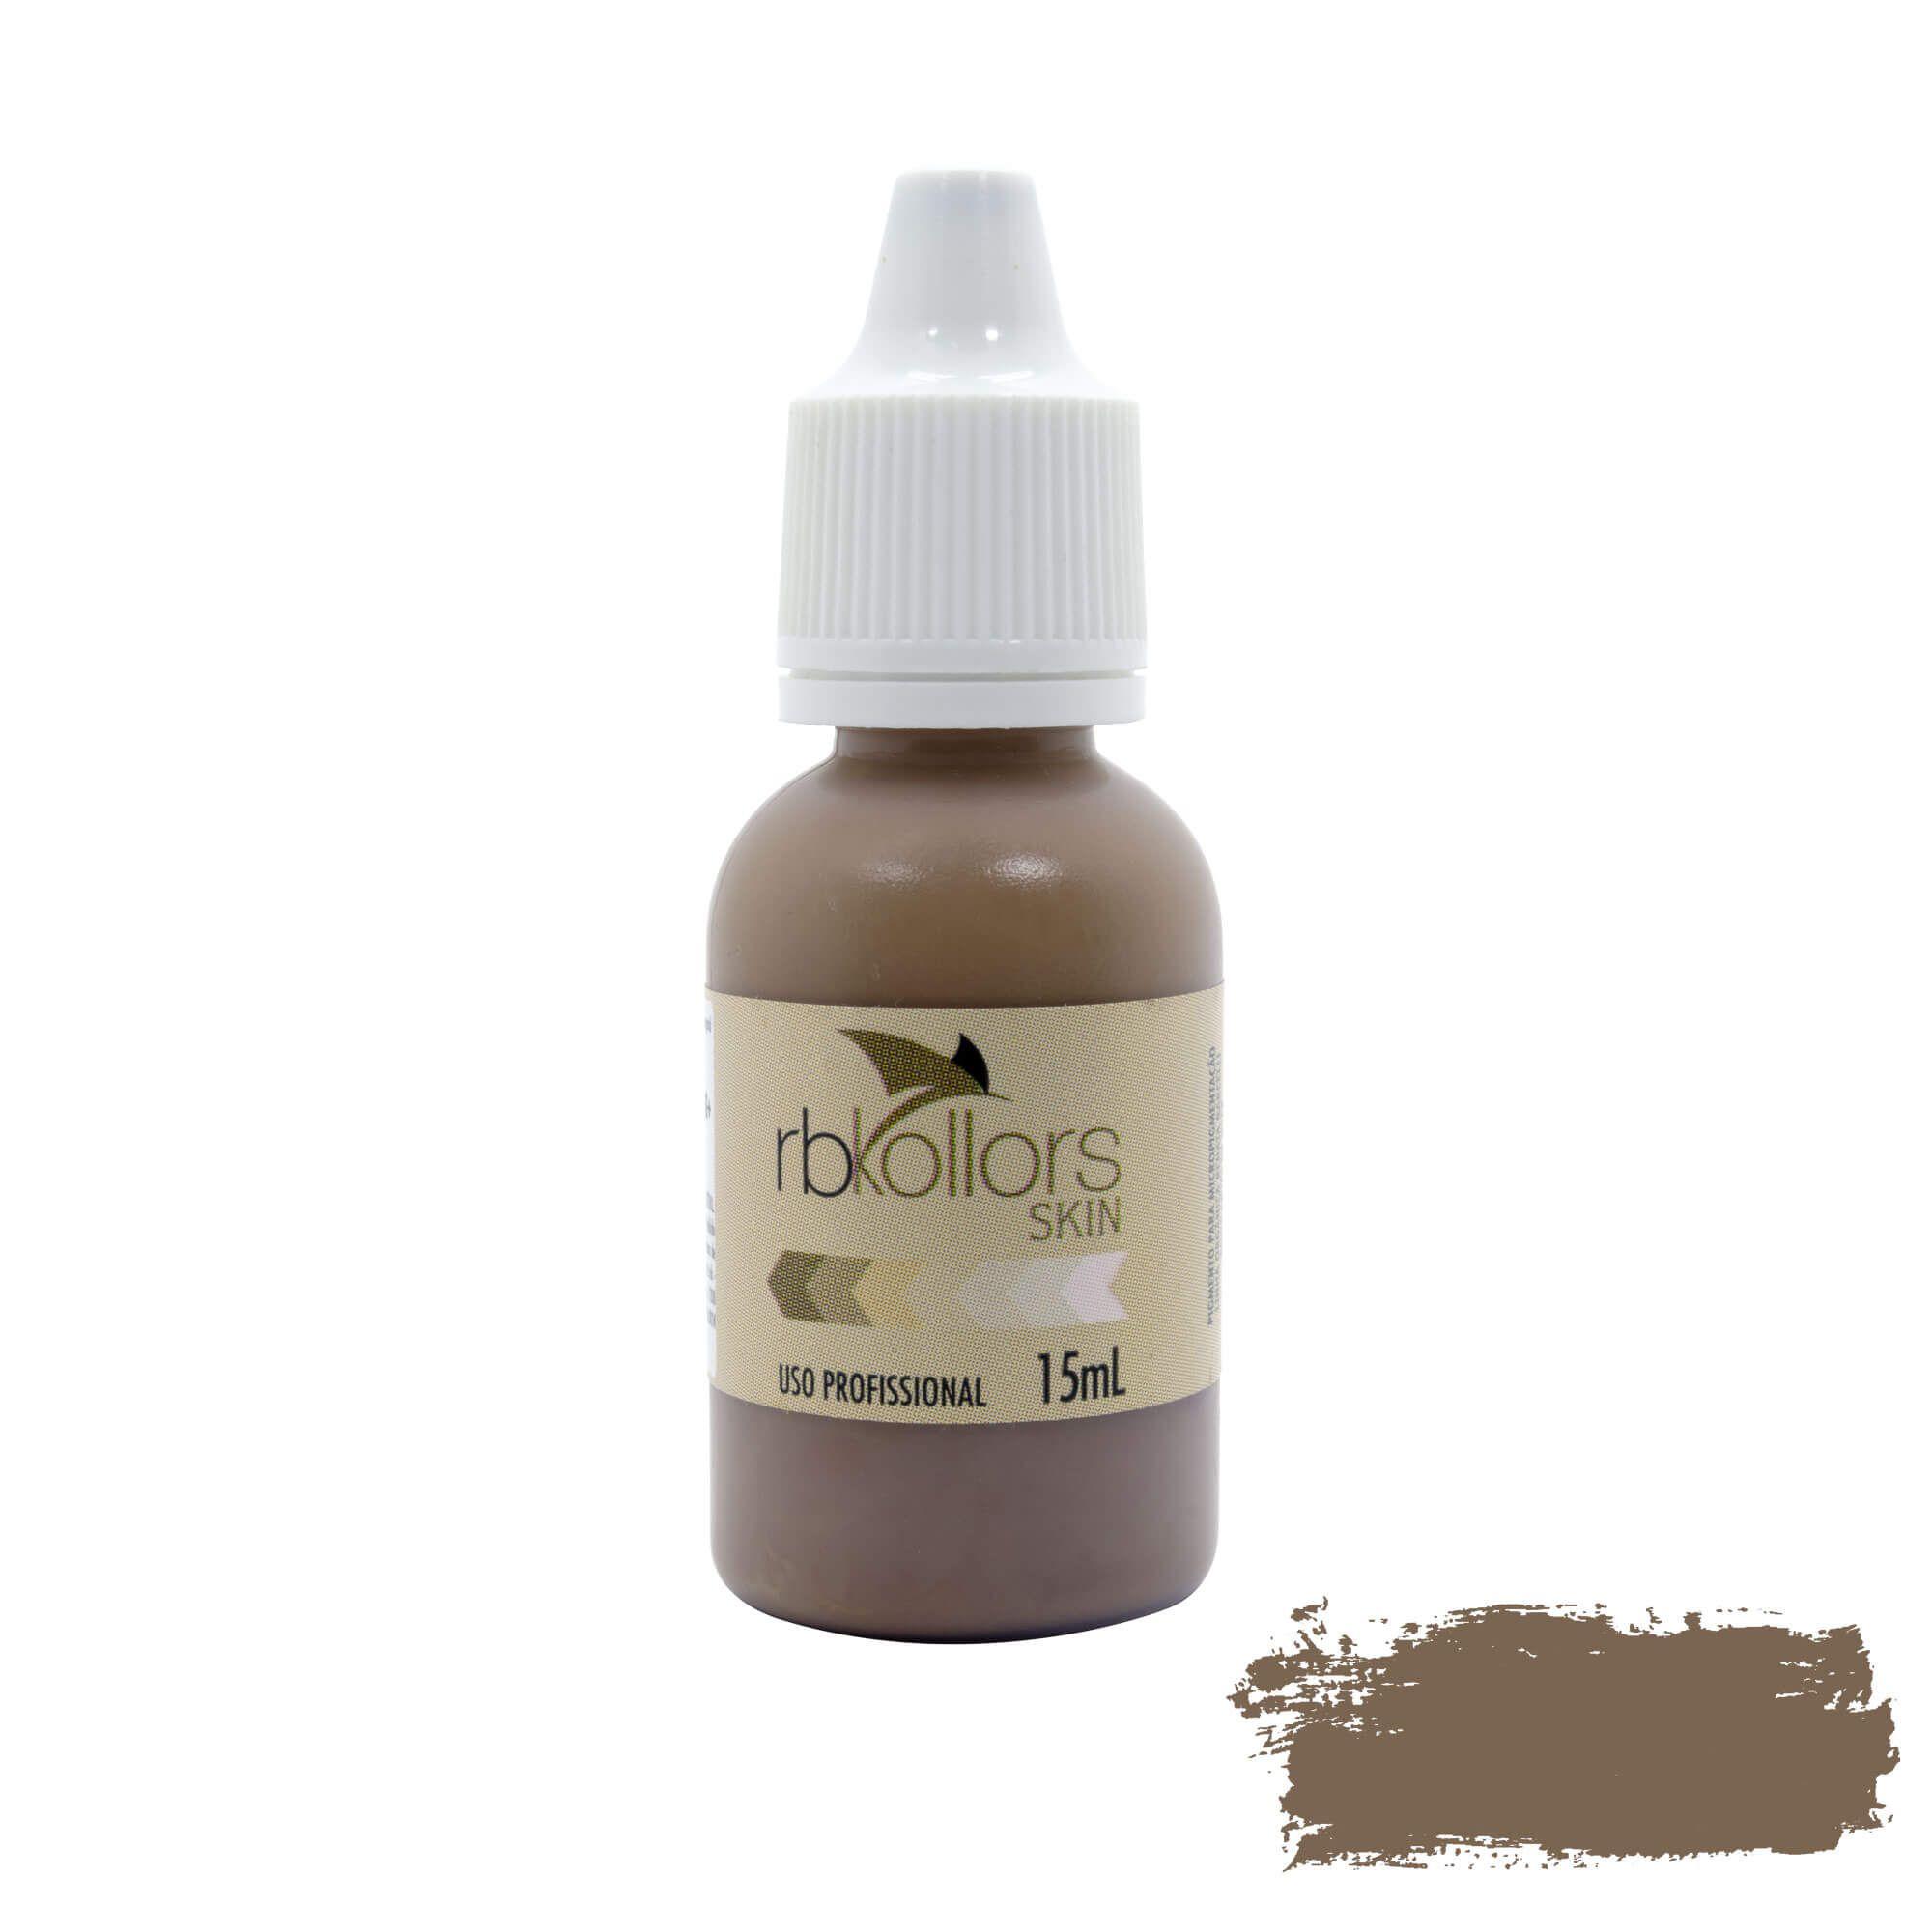 Pigmento Rb Kollors 15ml Skin 4